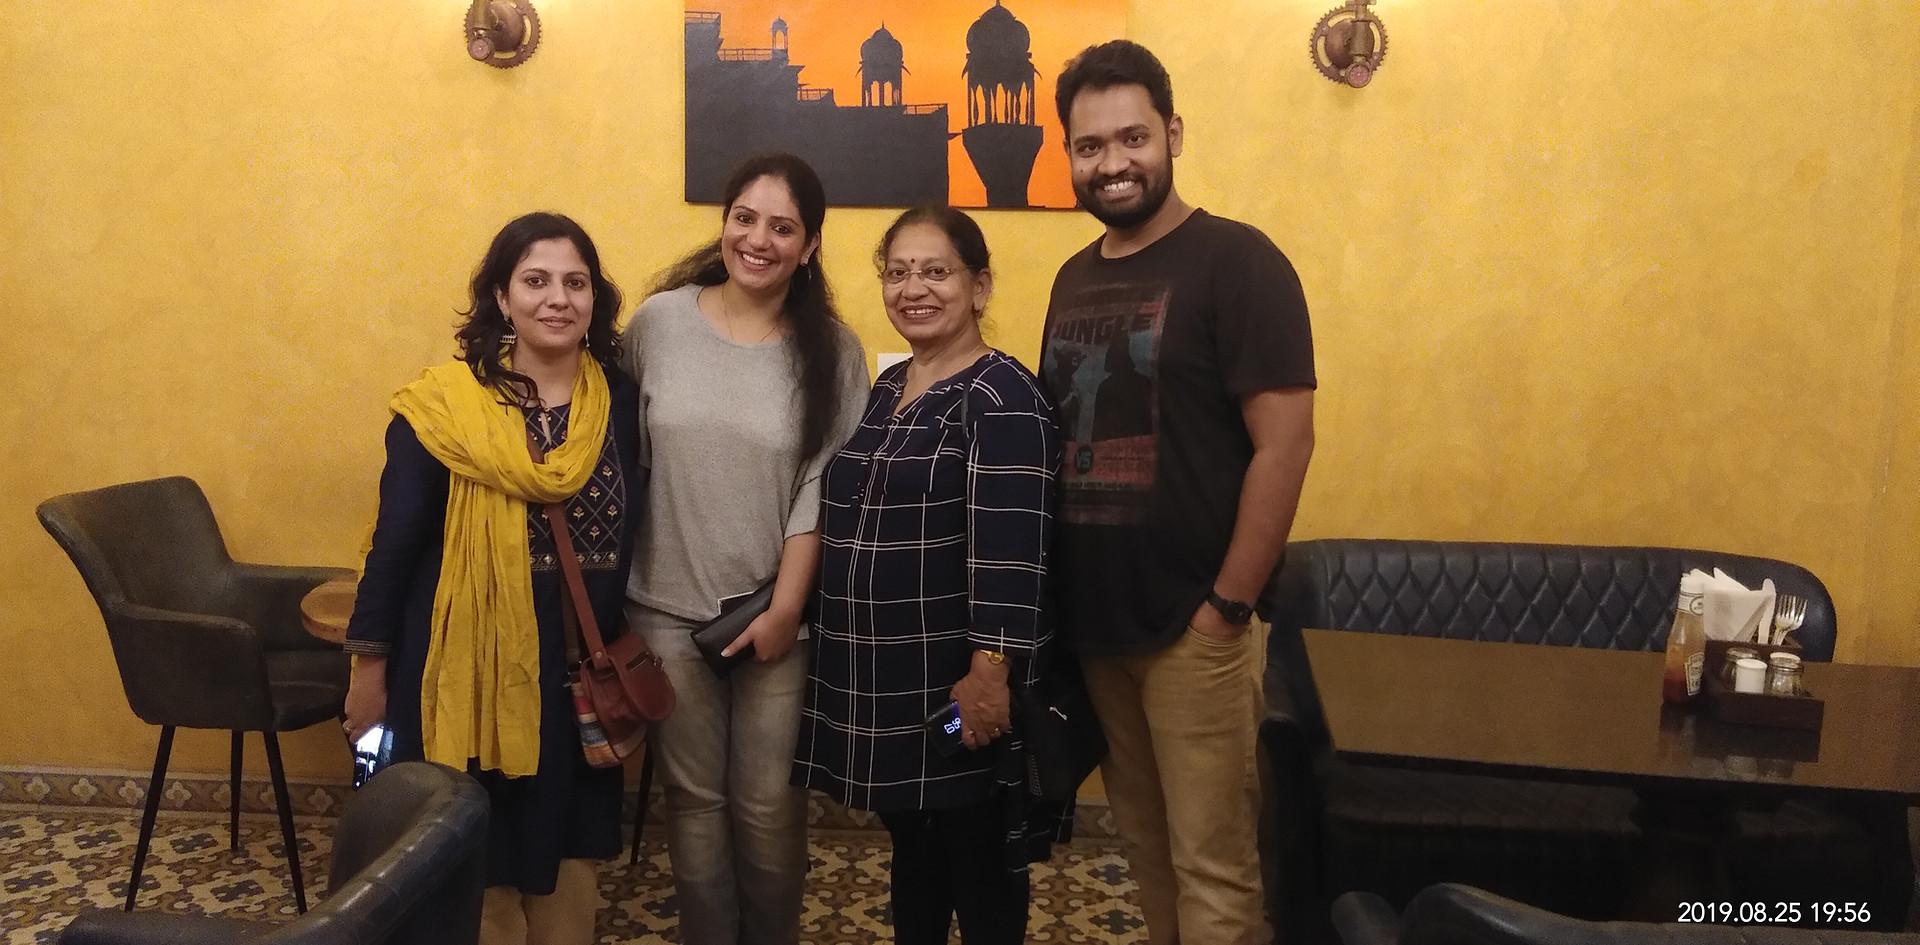 Ms Tabeena Anjum, Qureshi, Deccan Herald with Mrs. Aditi Gaur, Editor, Blub World, Mrs. Veena Gaur, Chairperson, Blub World and  Mr. Daksh Gaur, Founder, Blub World